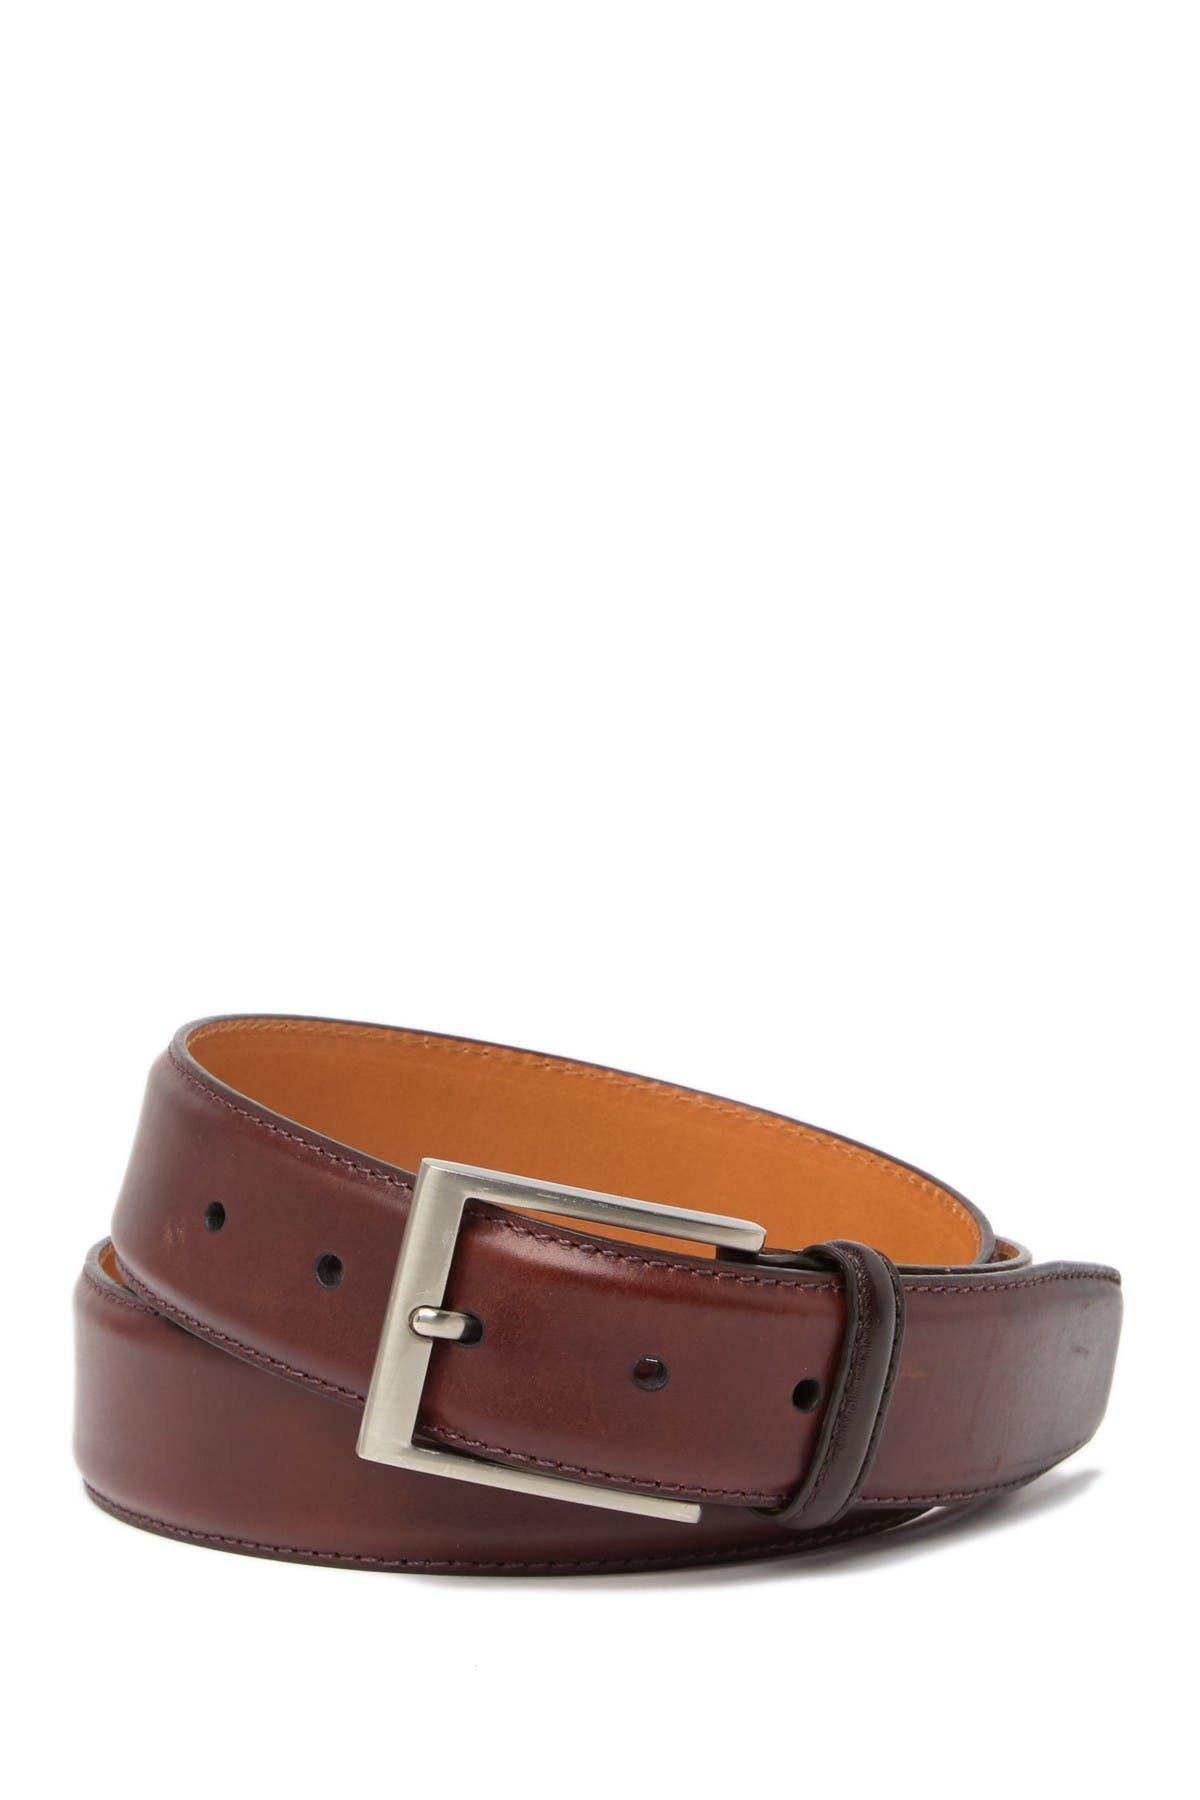 Image of Magnanni Catabonia Leather Belt